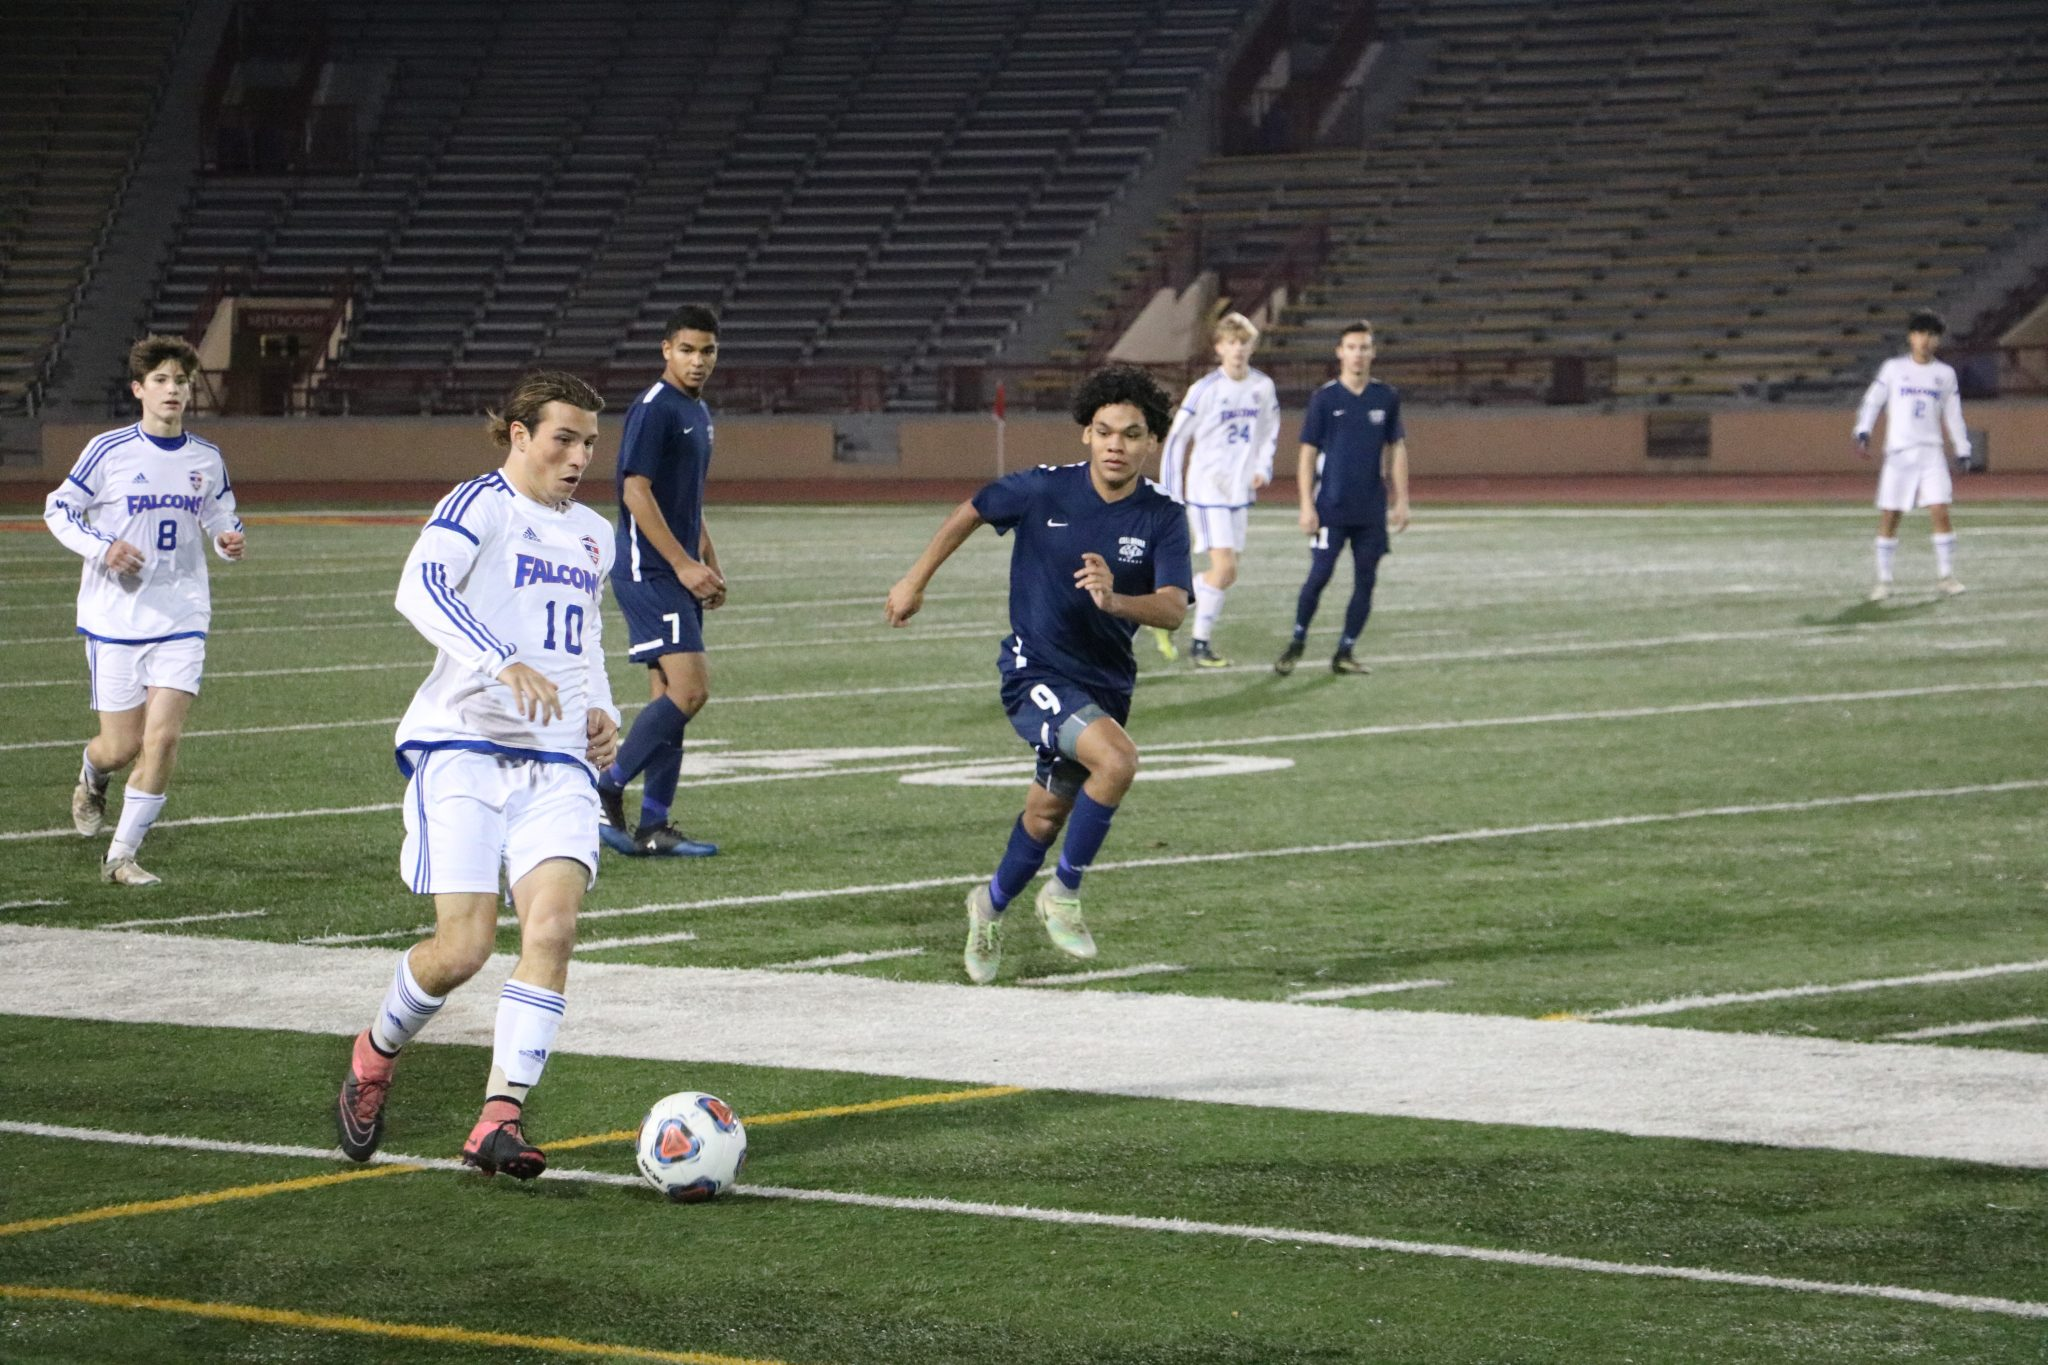 Falcons Soccer Strikes Back